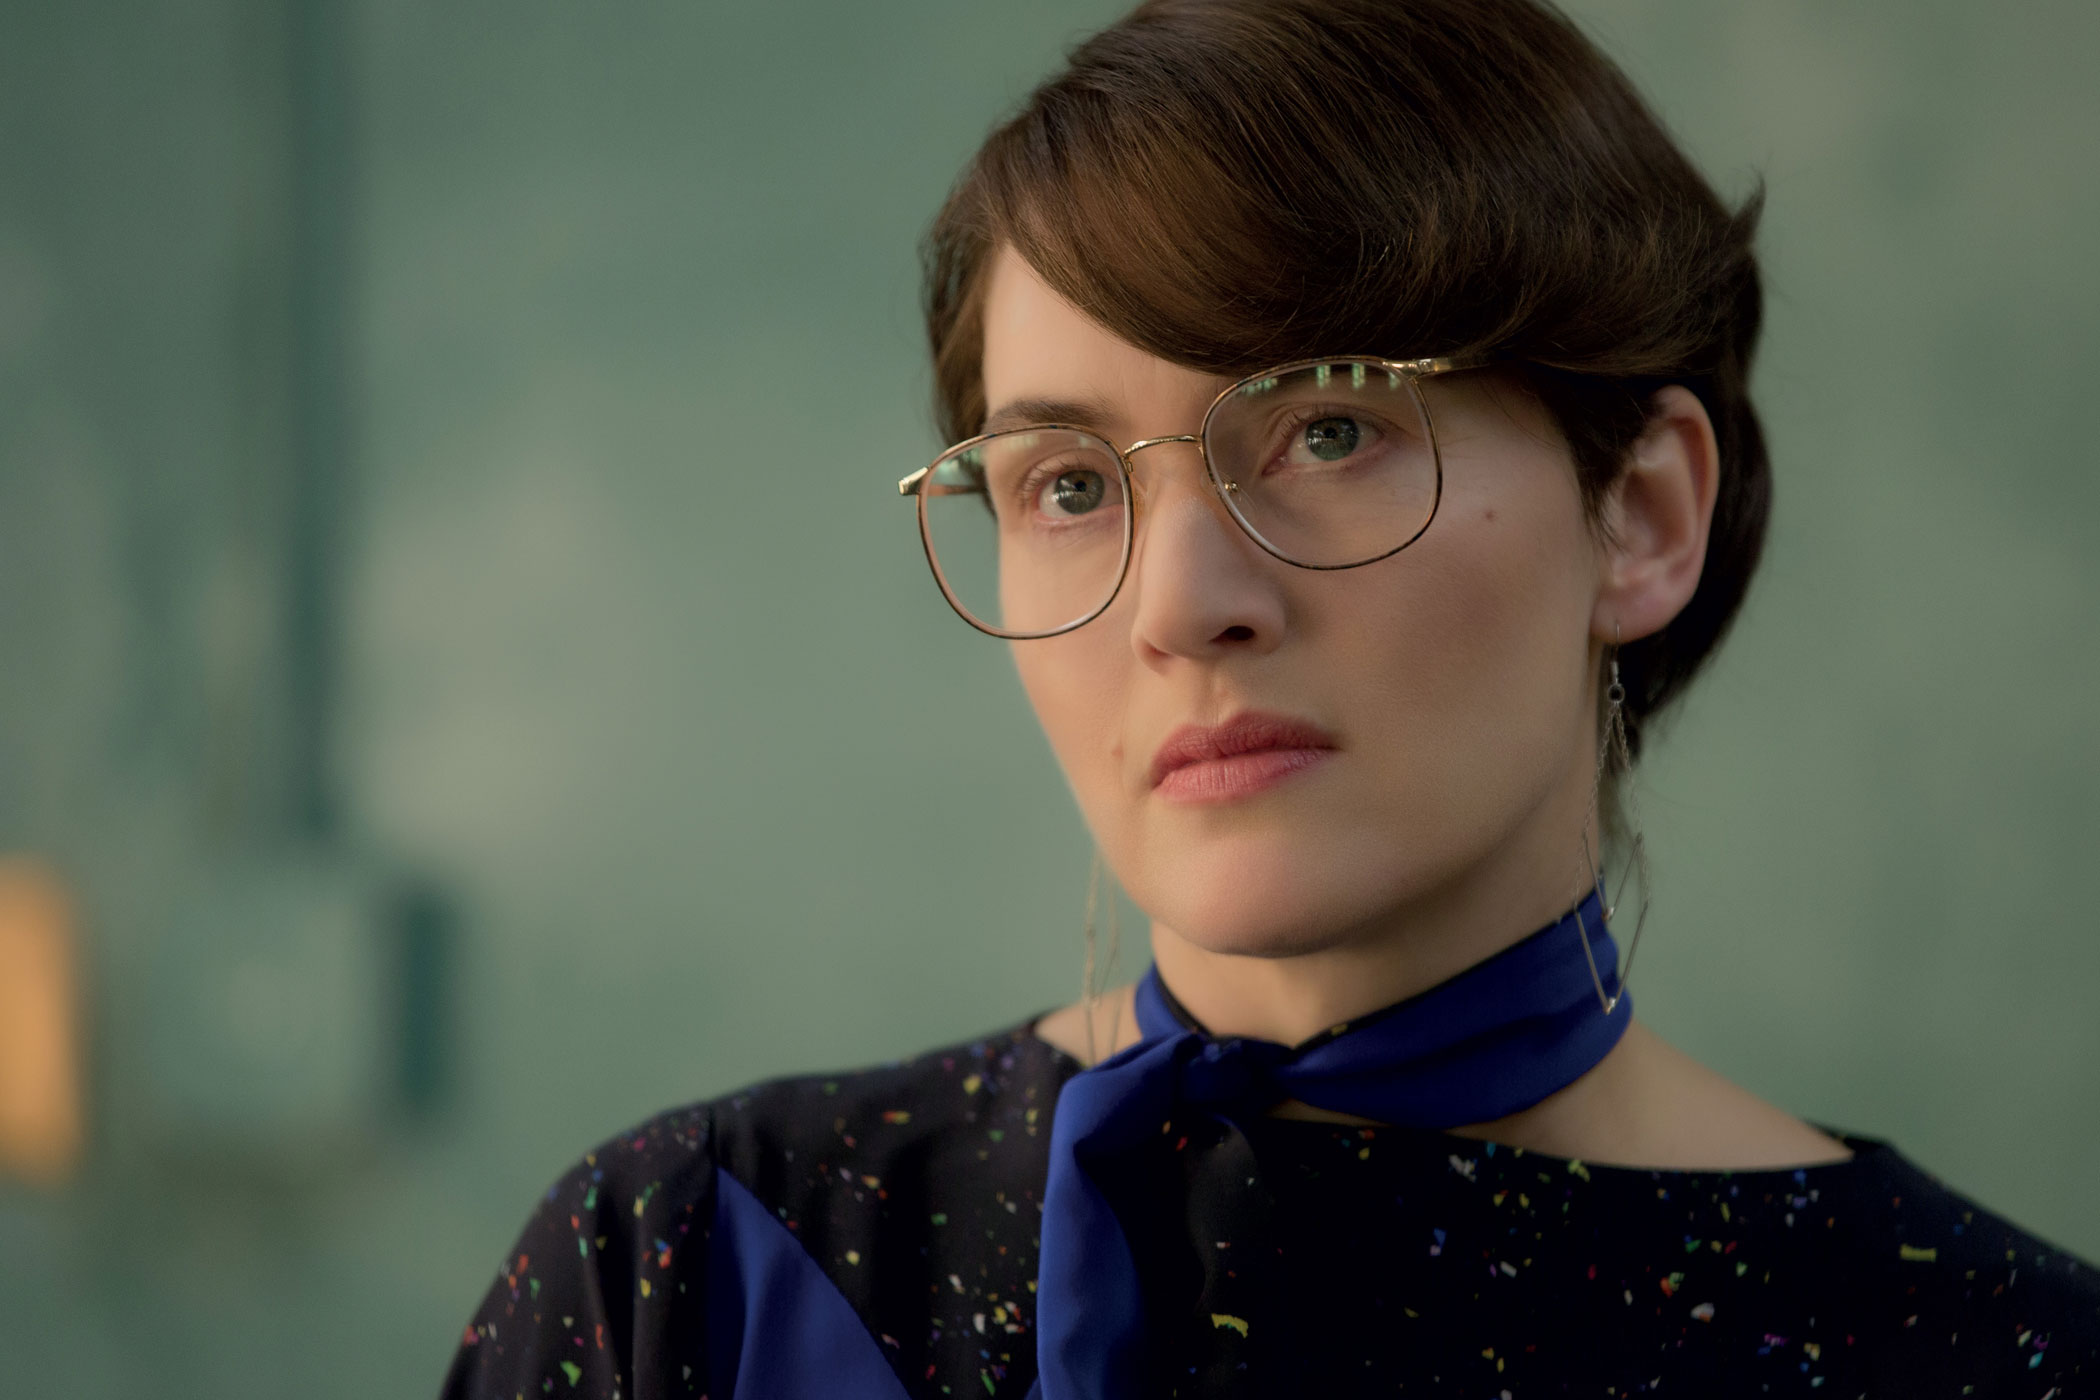 Joanna Hoffman in Steve Jobs, 2015.